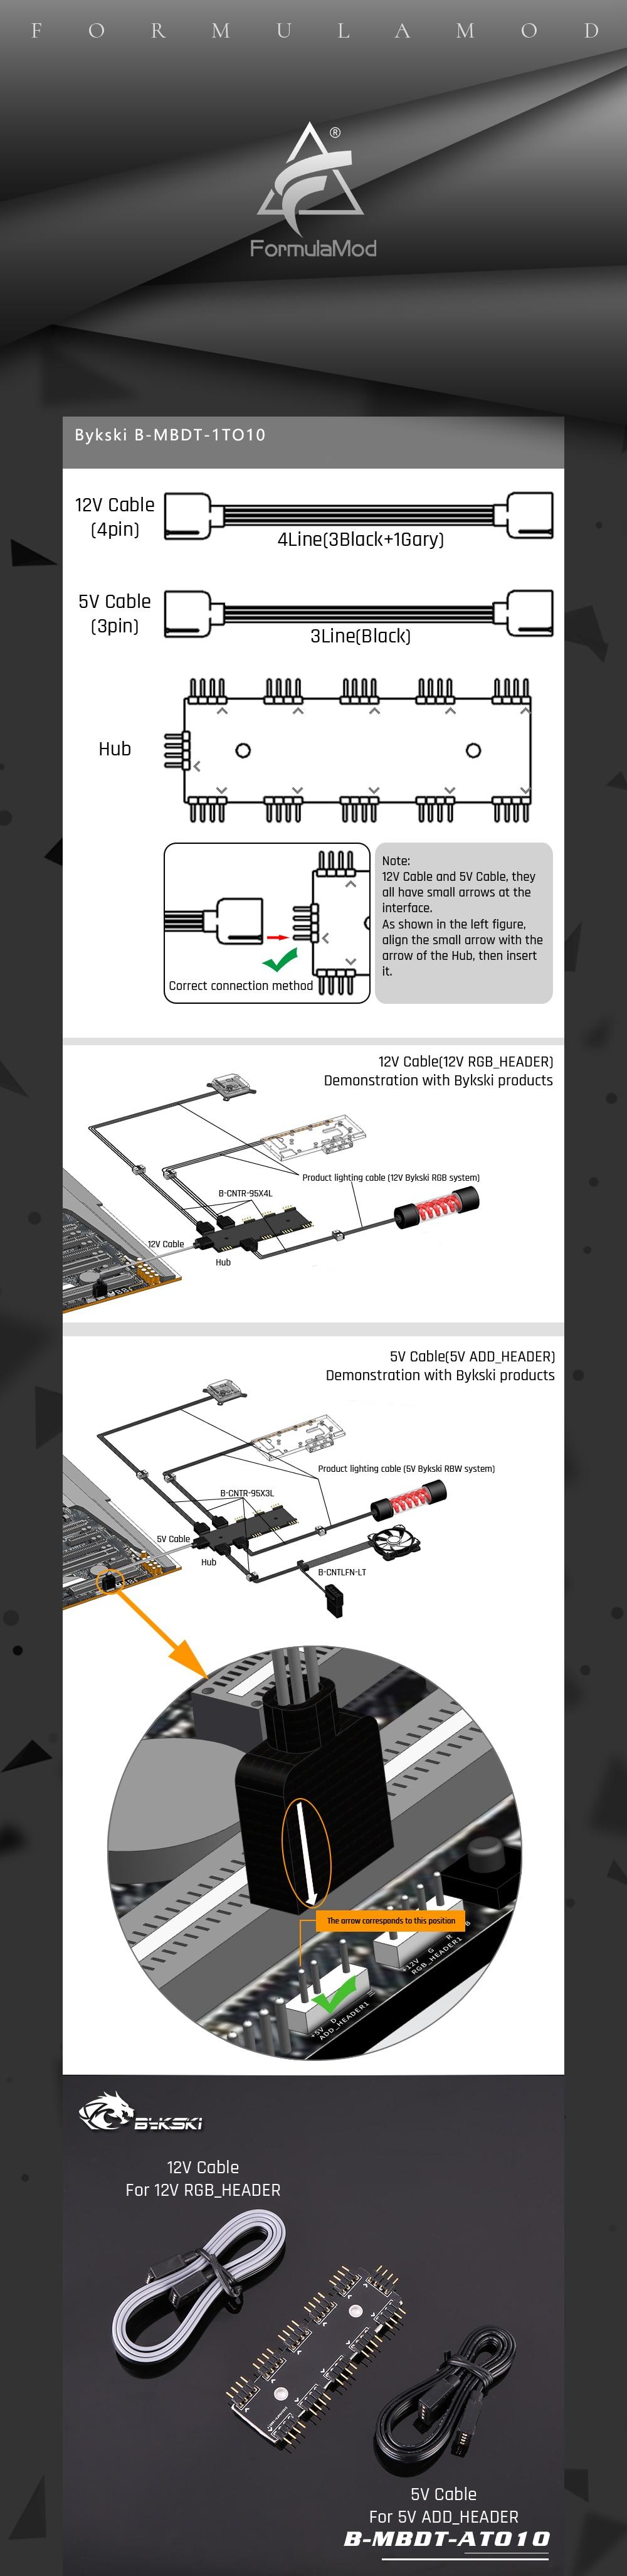 Bykski B-MBDT-1TO10, Motherboard Aura Hubs, 3Pin/4Pin Motherborad Aura Interface 1 To 10 Hub